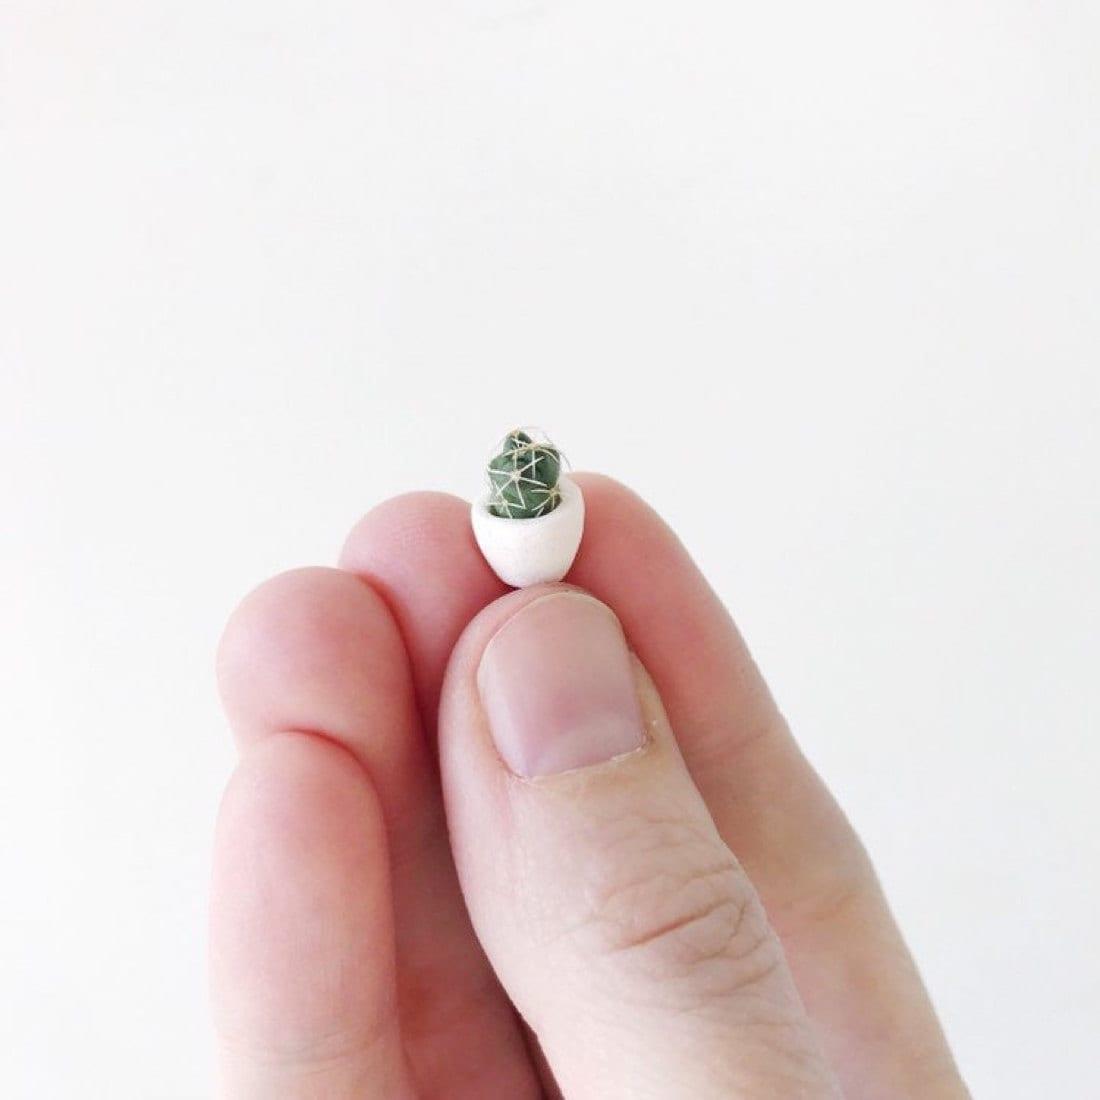 A miniature cactus planter from Tierra Sol Studio